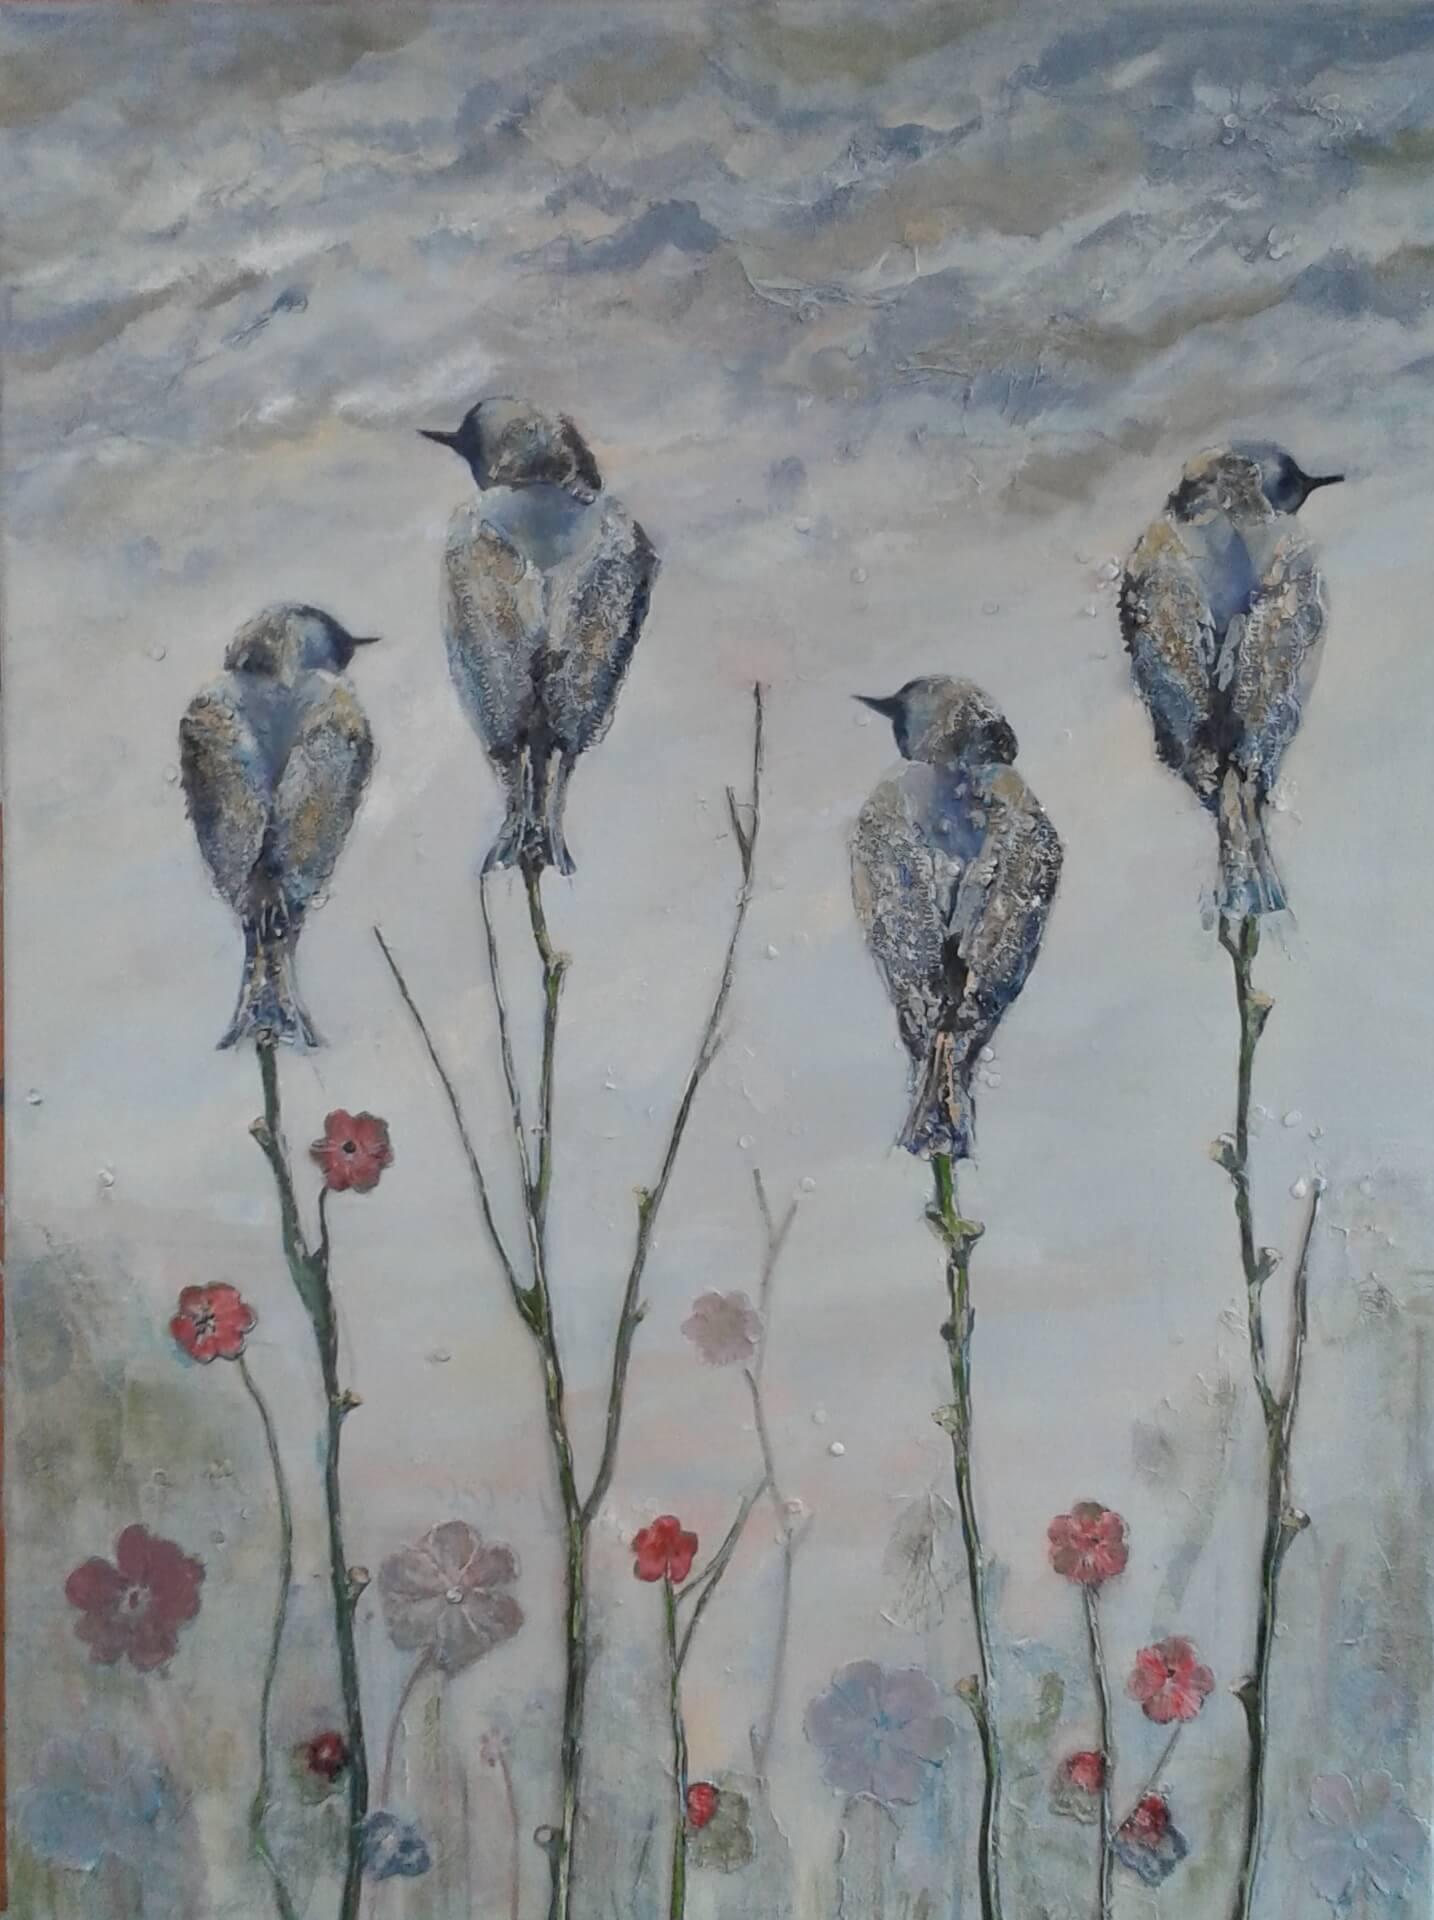 kristel_jacobs_bluebirds_2017_80x60